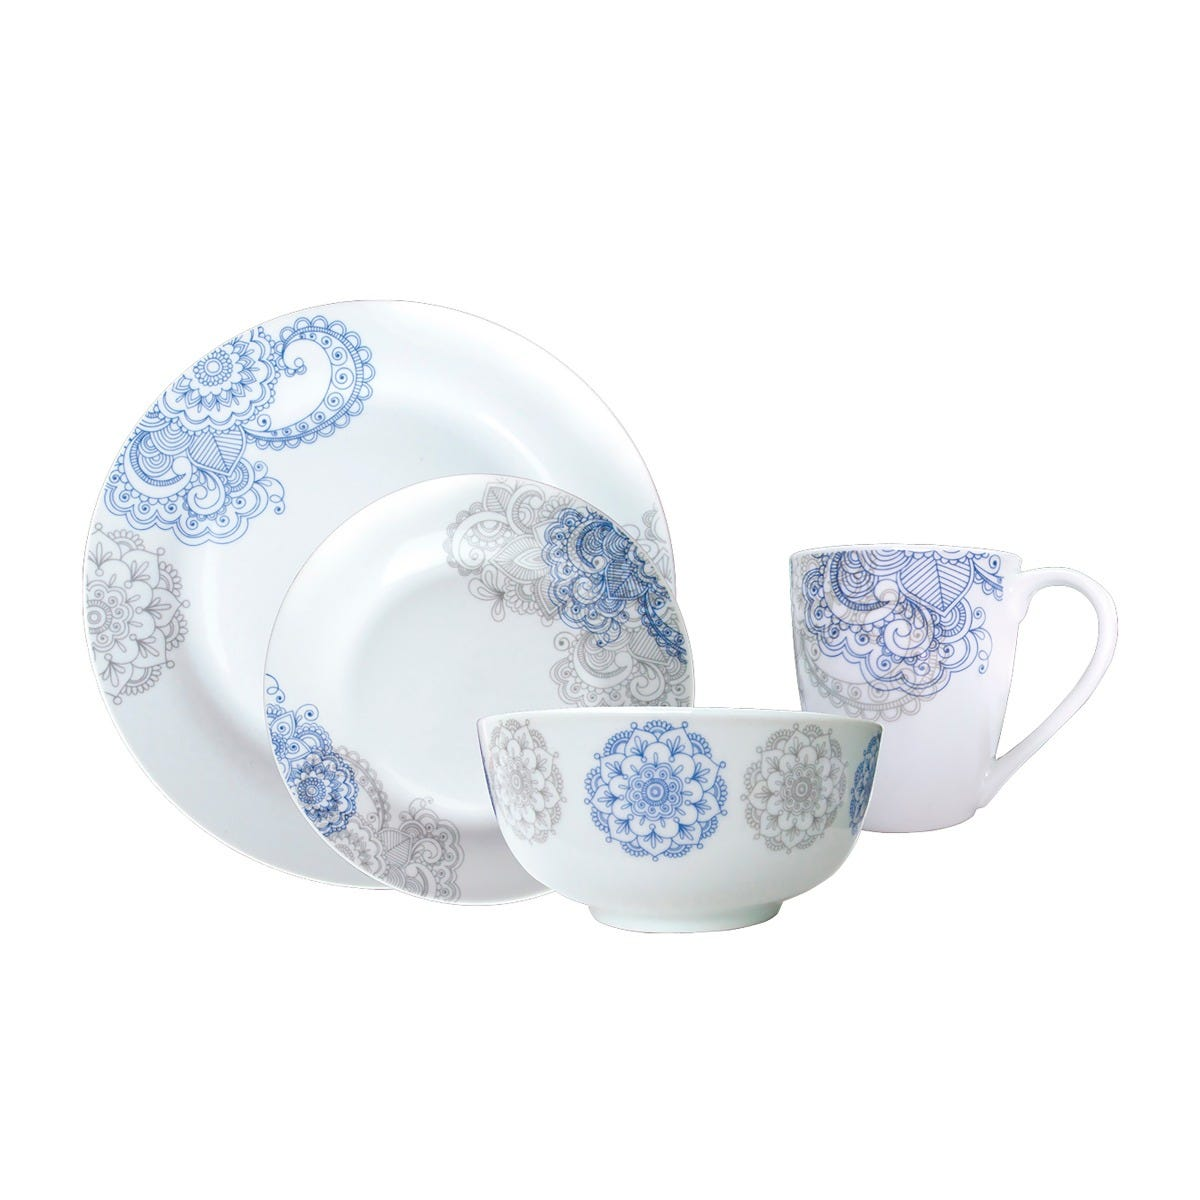 Vajilla Love and Lemons® Bohemio de Porcelana 16 piezas